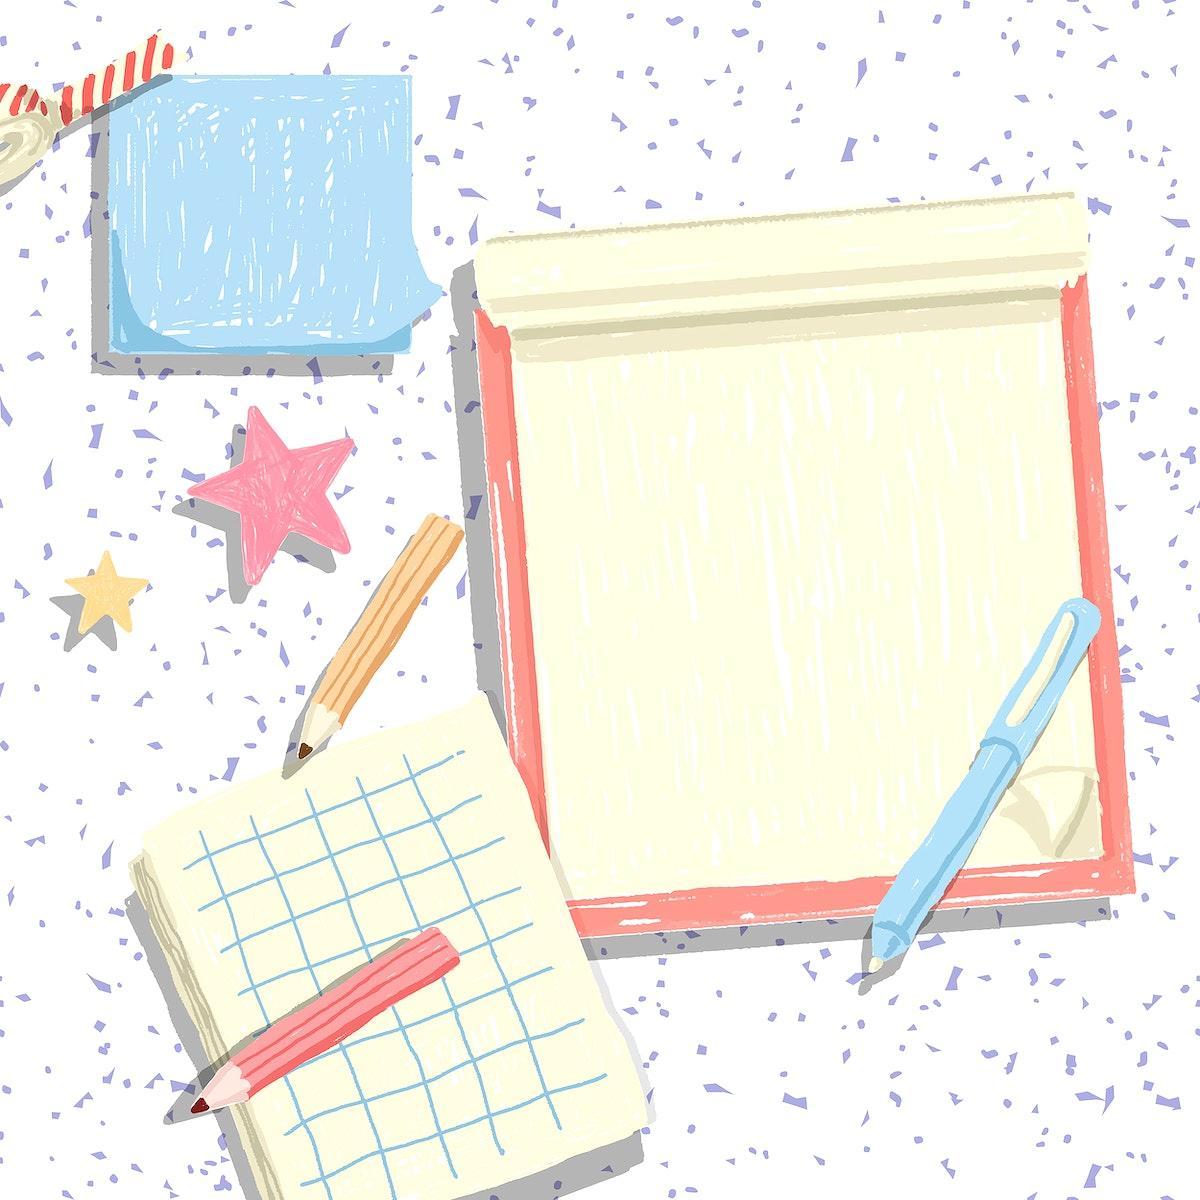 Blank scarpbook on a confetti background vector